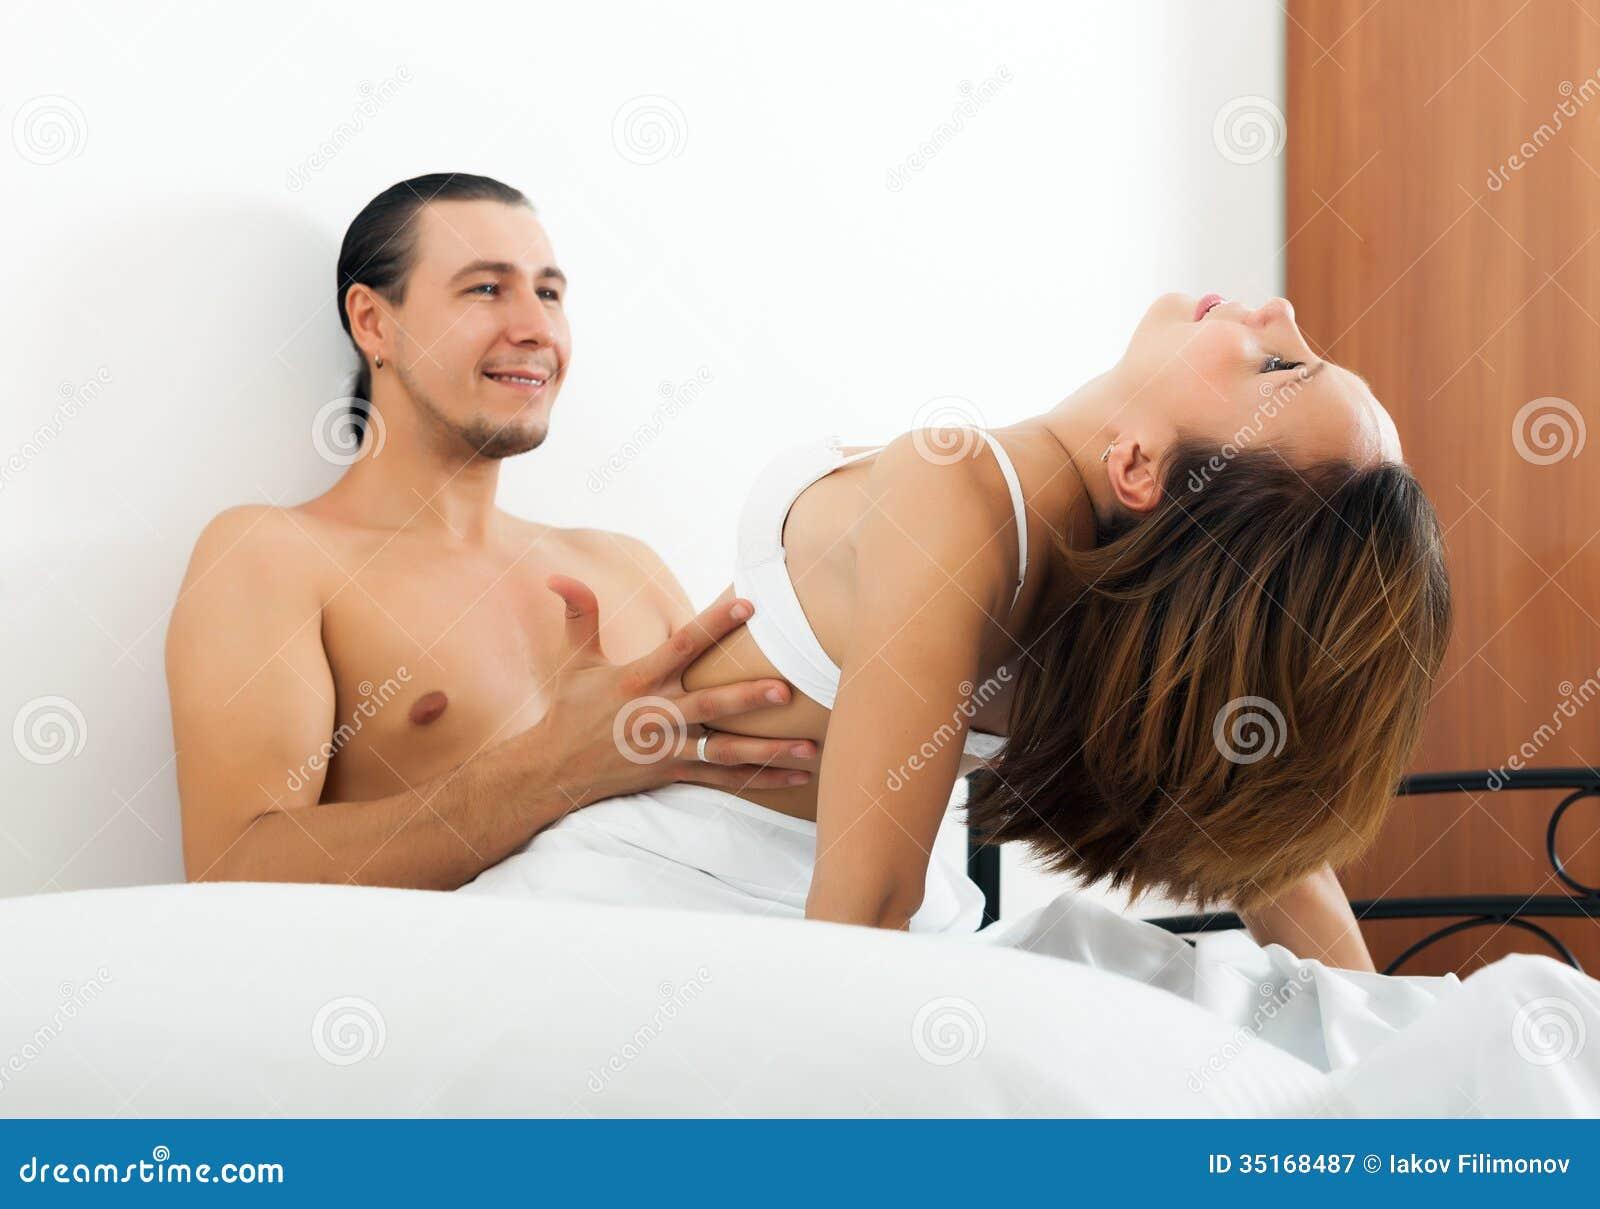 krasivie-kartinki-seks-zhenshina-sidya